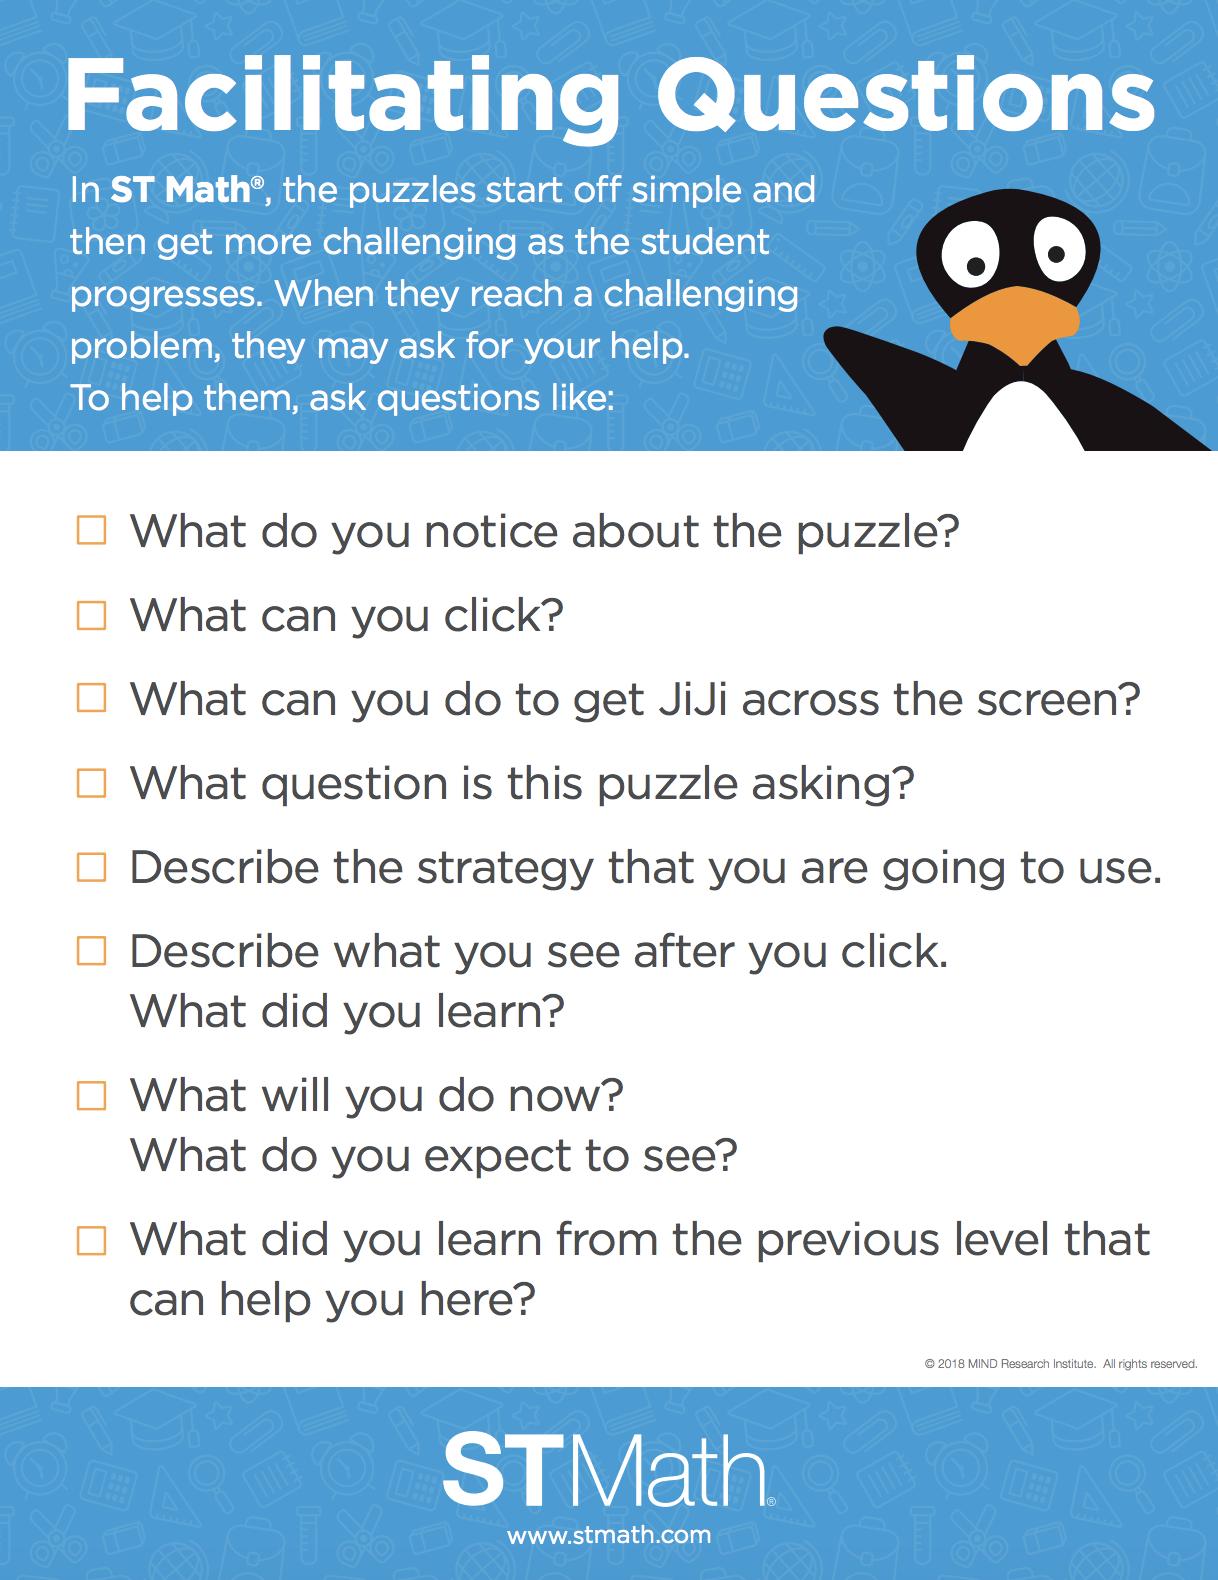 Facilitating Questions Poster St Math Parent Resources Math